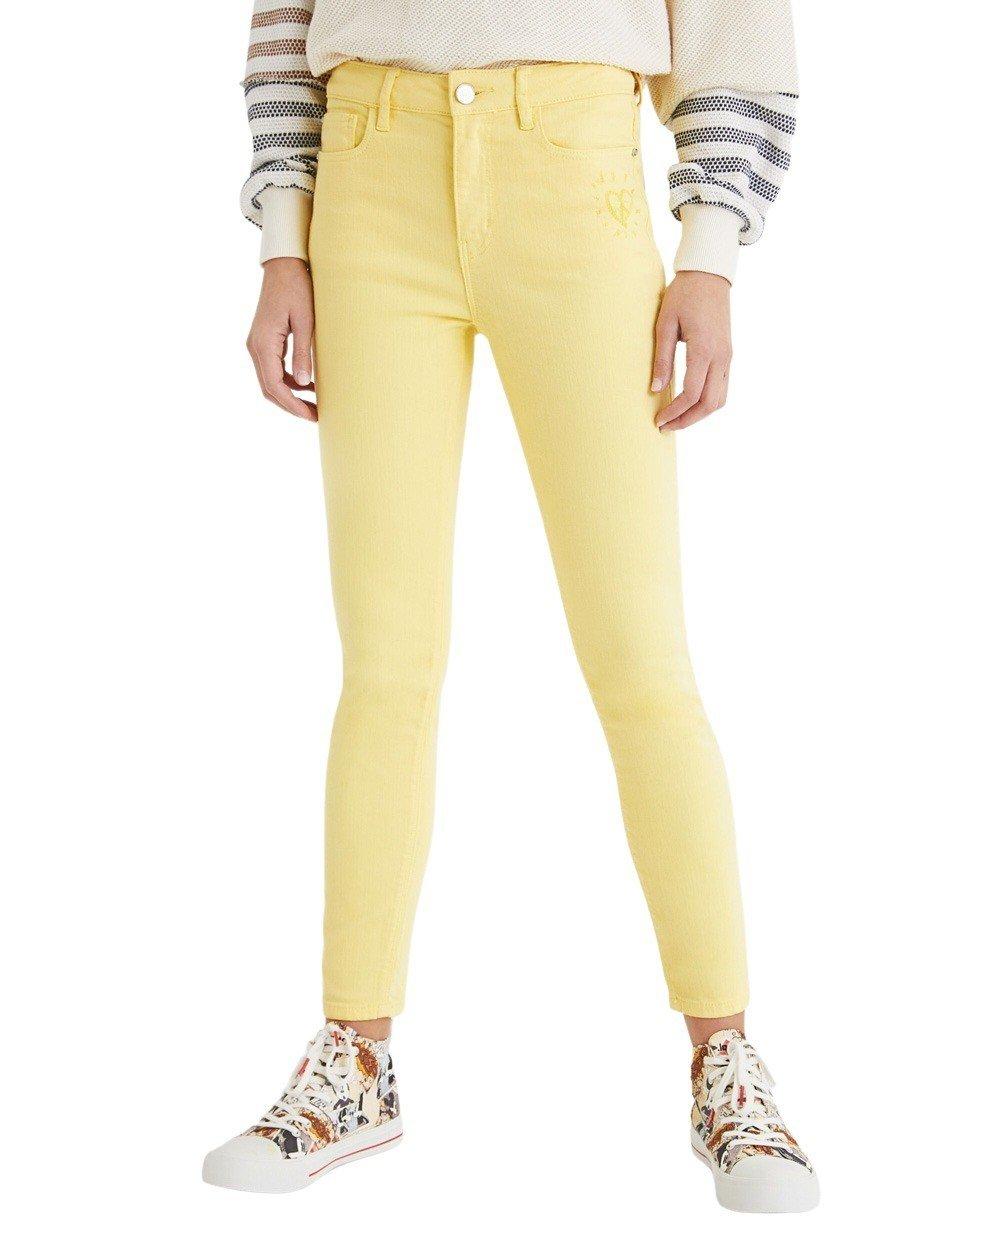 Desigual Women's Trouser Various Colours 203944 - yellow 40